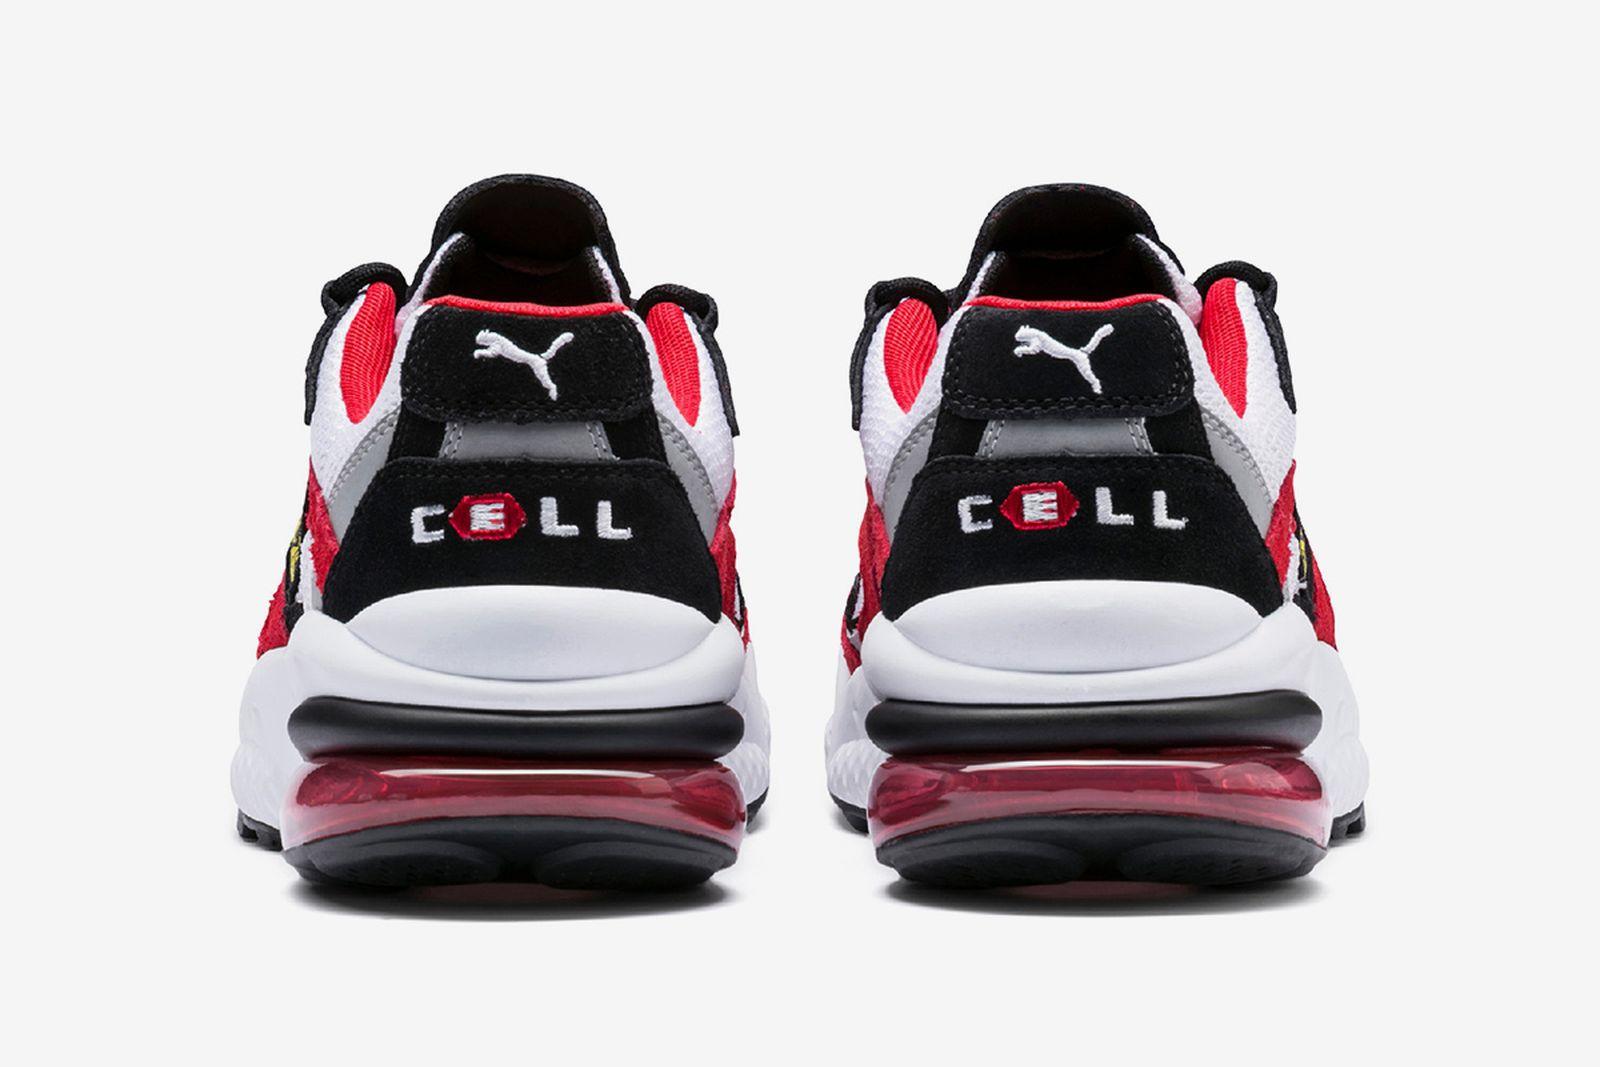 ferrari puma cell viper release date price PUMA Cell Venom